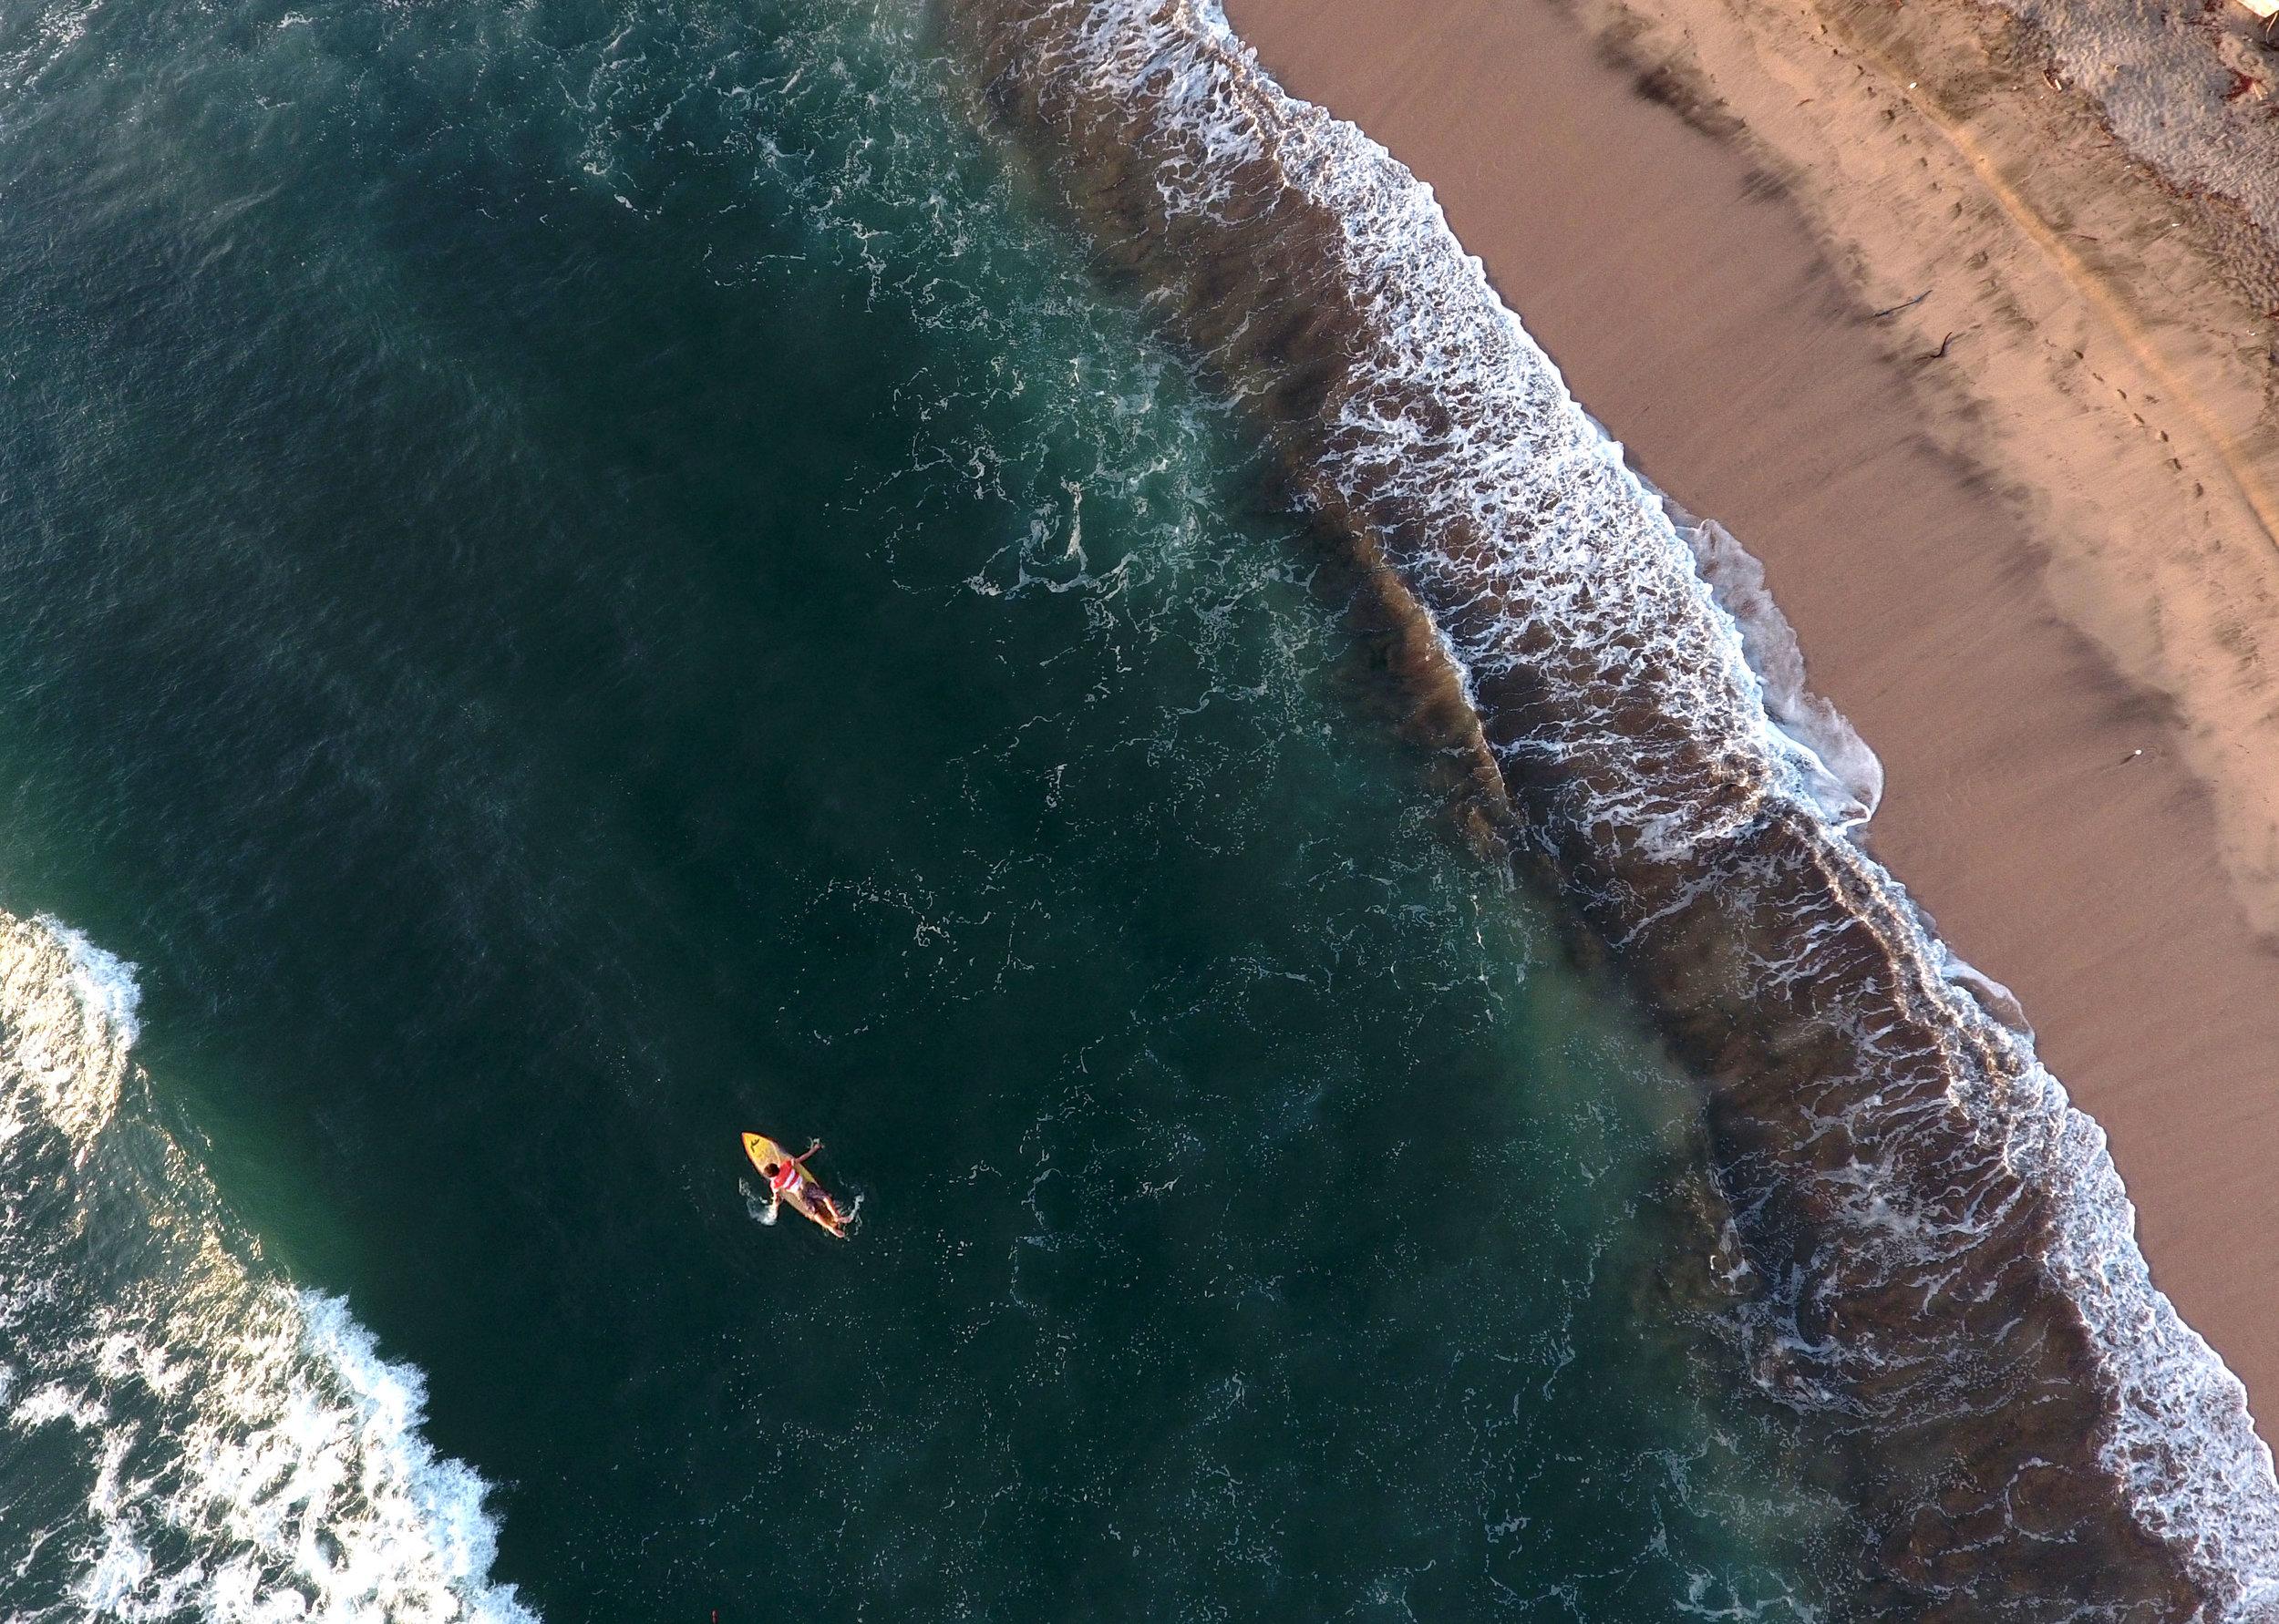 surfing kid callejones.jpg